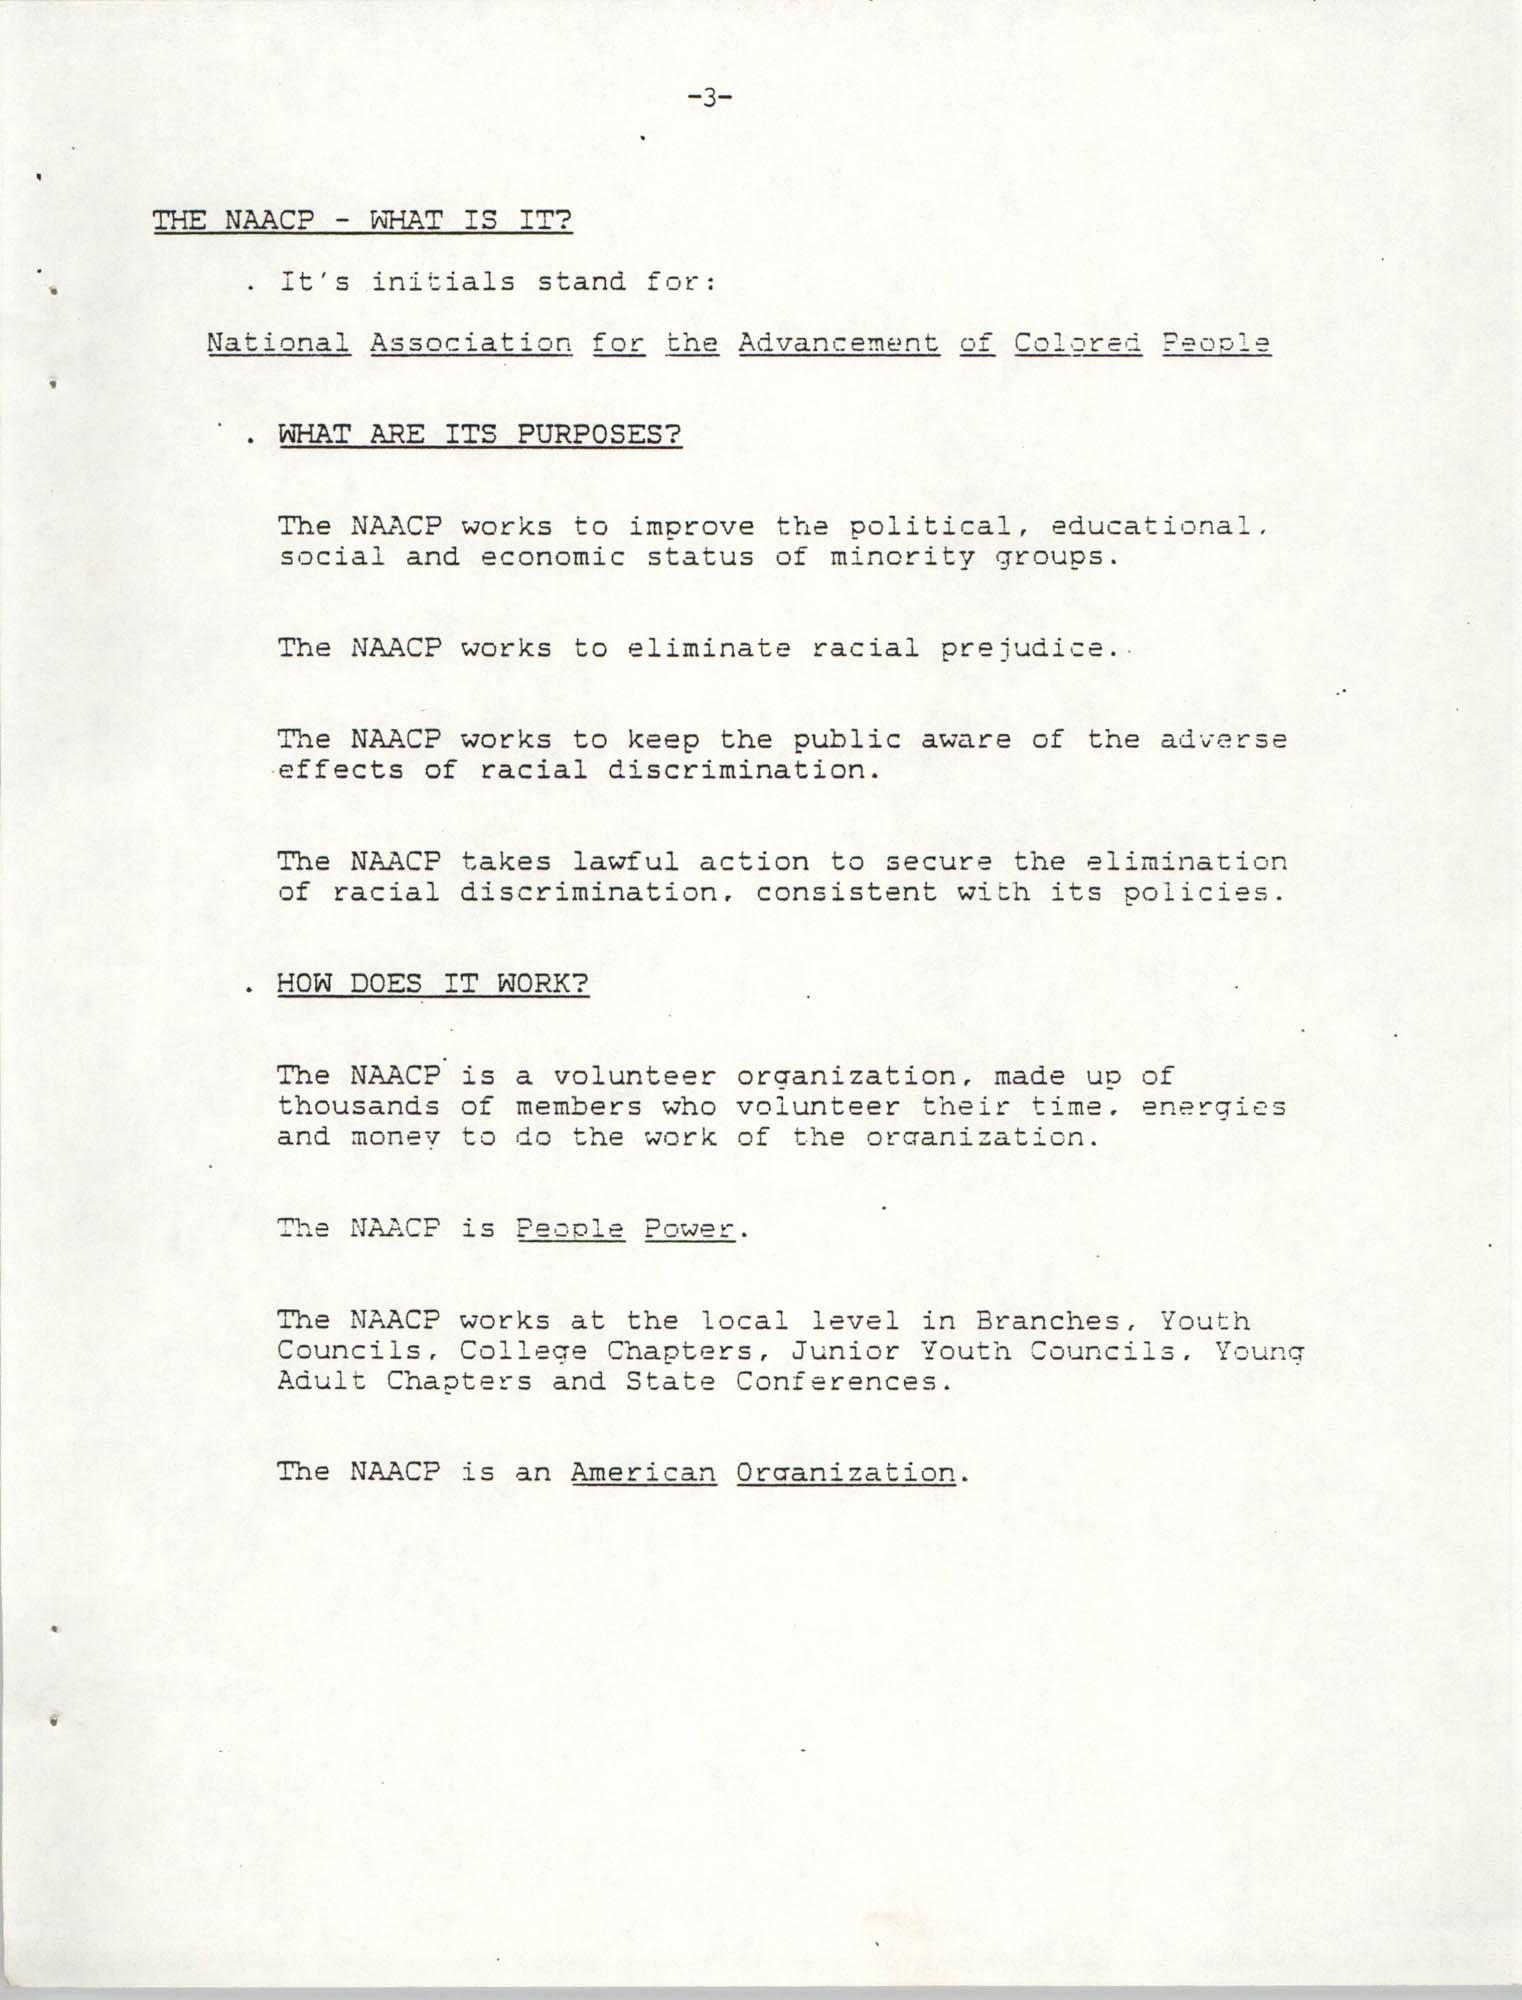 NAACP Mandatory Training Handbook, 1989, Page 3